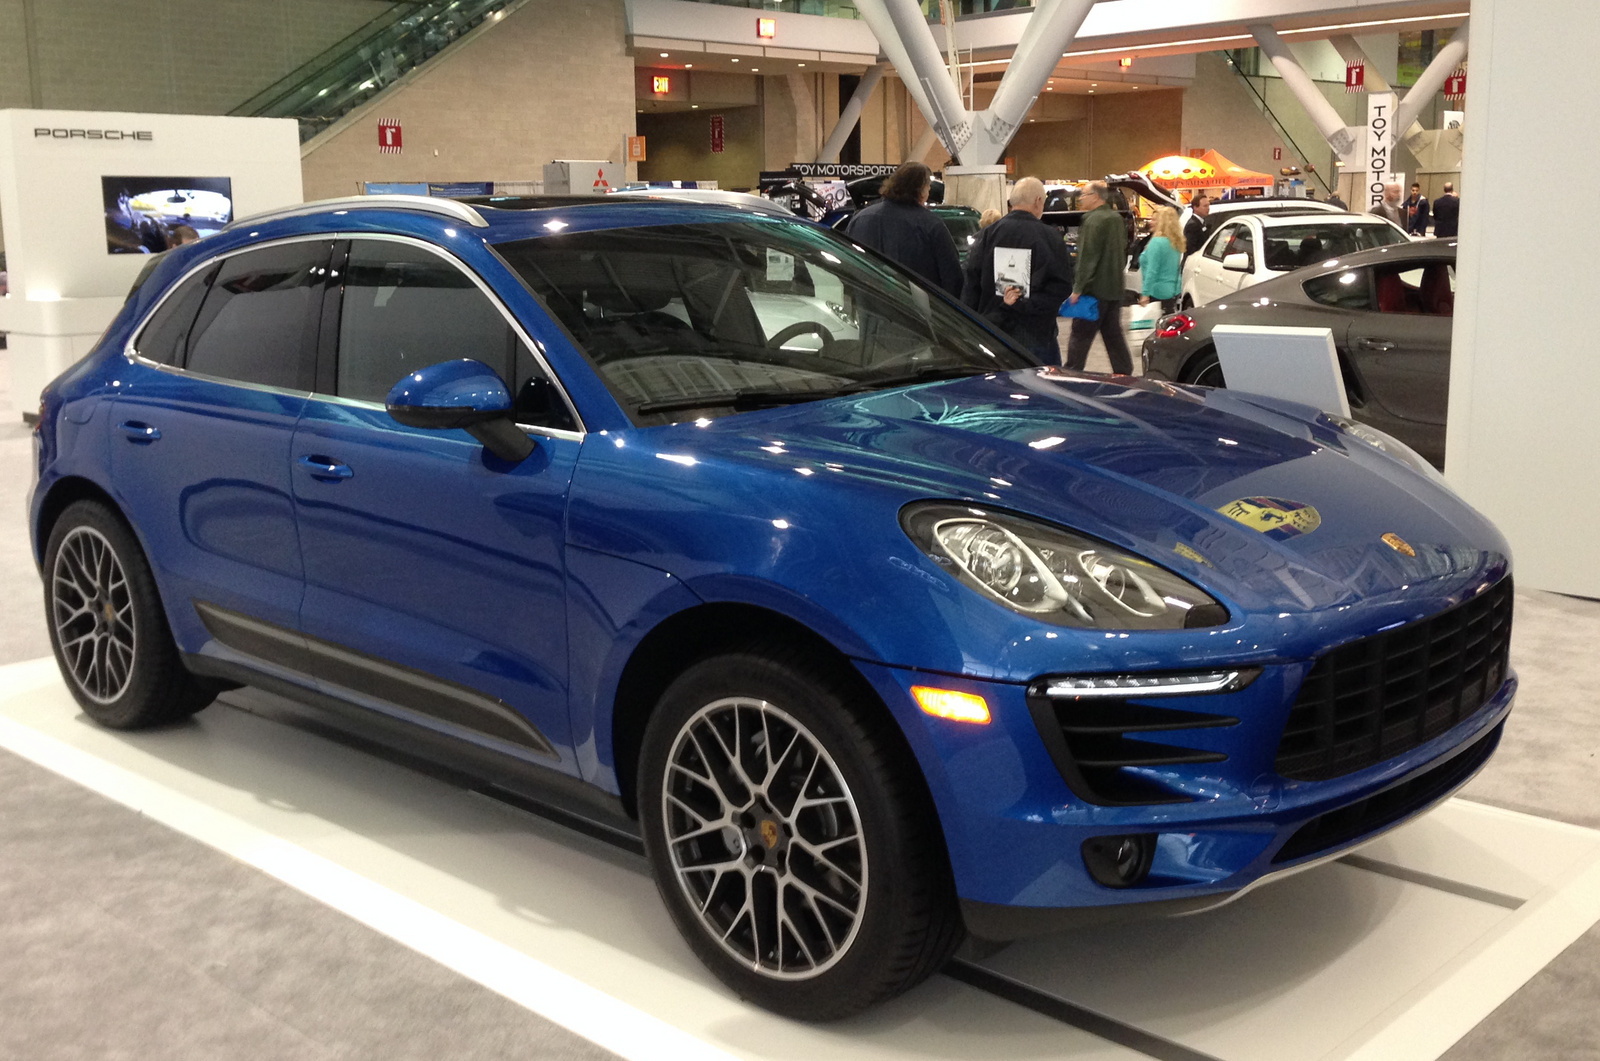 2015 Porsche Macan - Overview - CarGurus